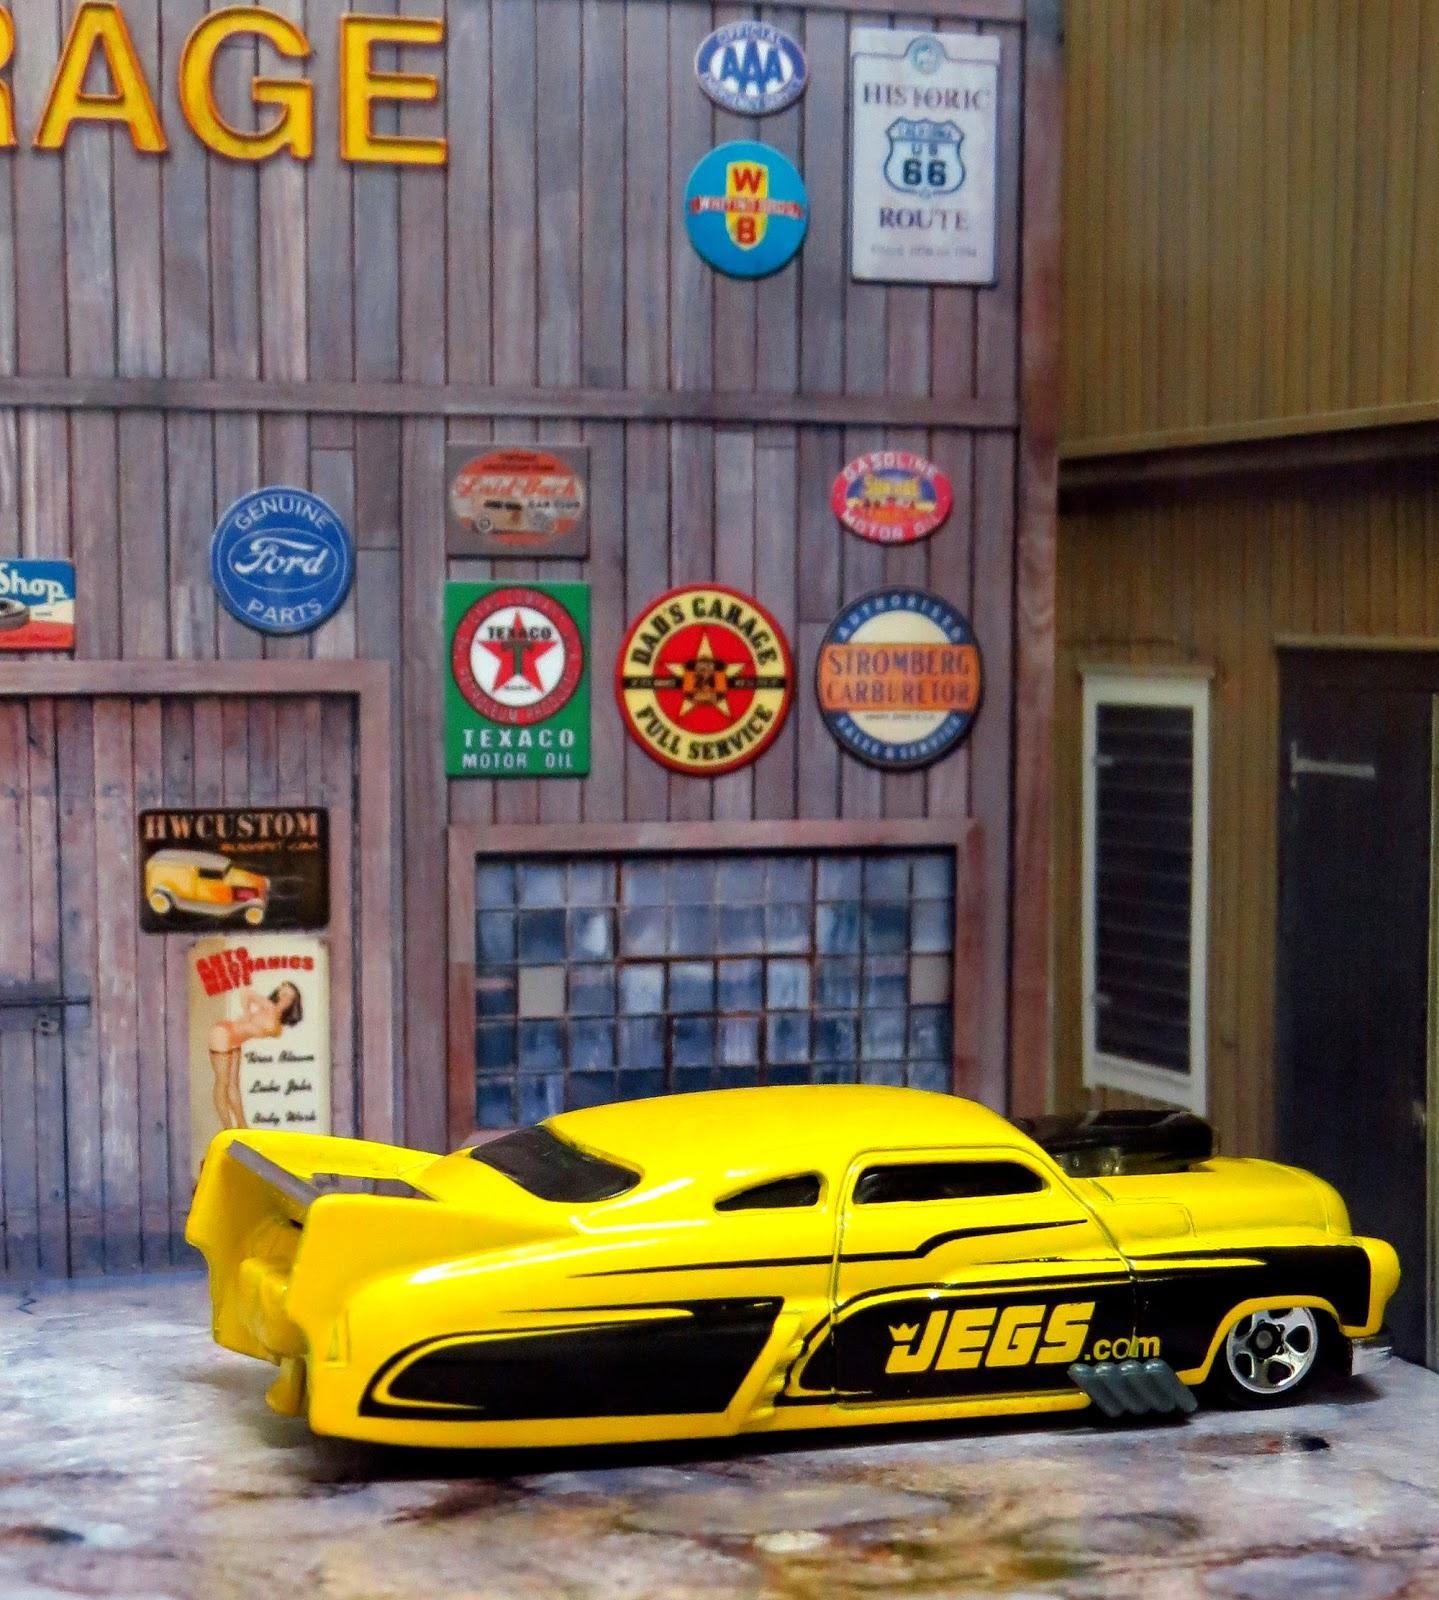 Ford+Mercury+Dragster+1949+%234+-+2012 Surprising Lamborghini Gallardo Hot Wheels Wiki Cars Trend